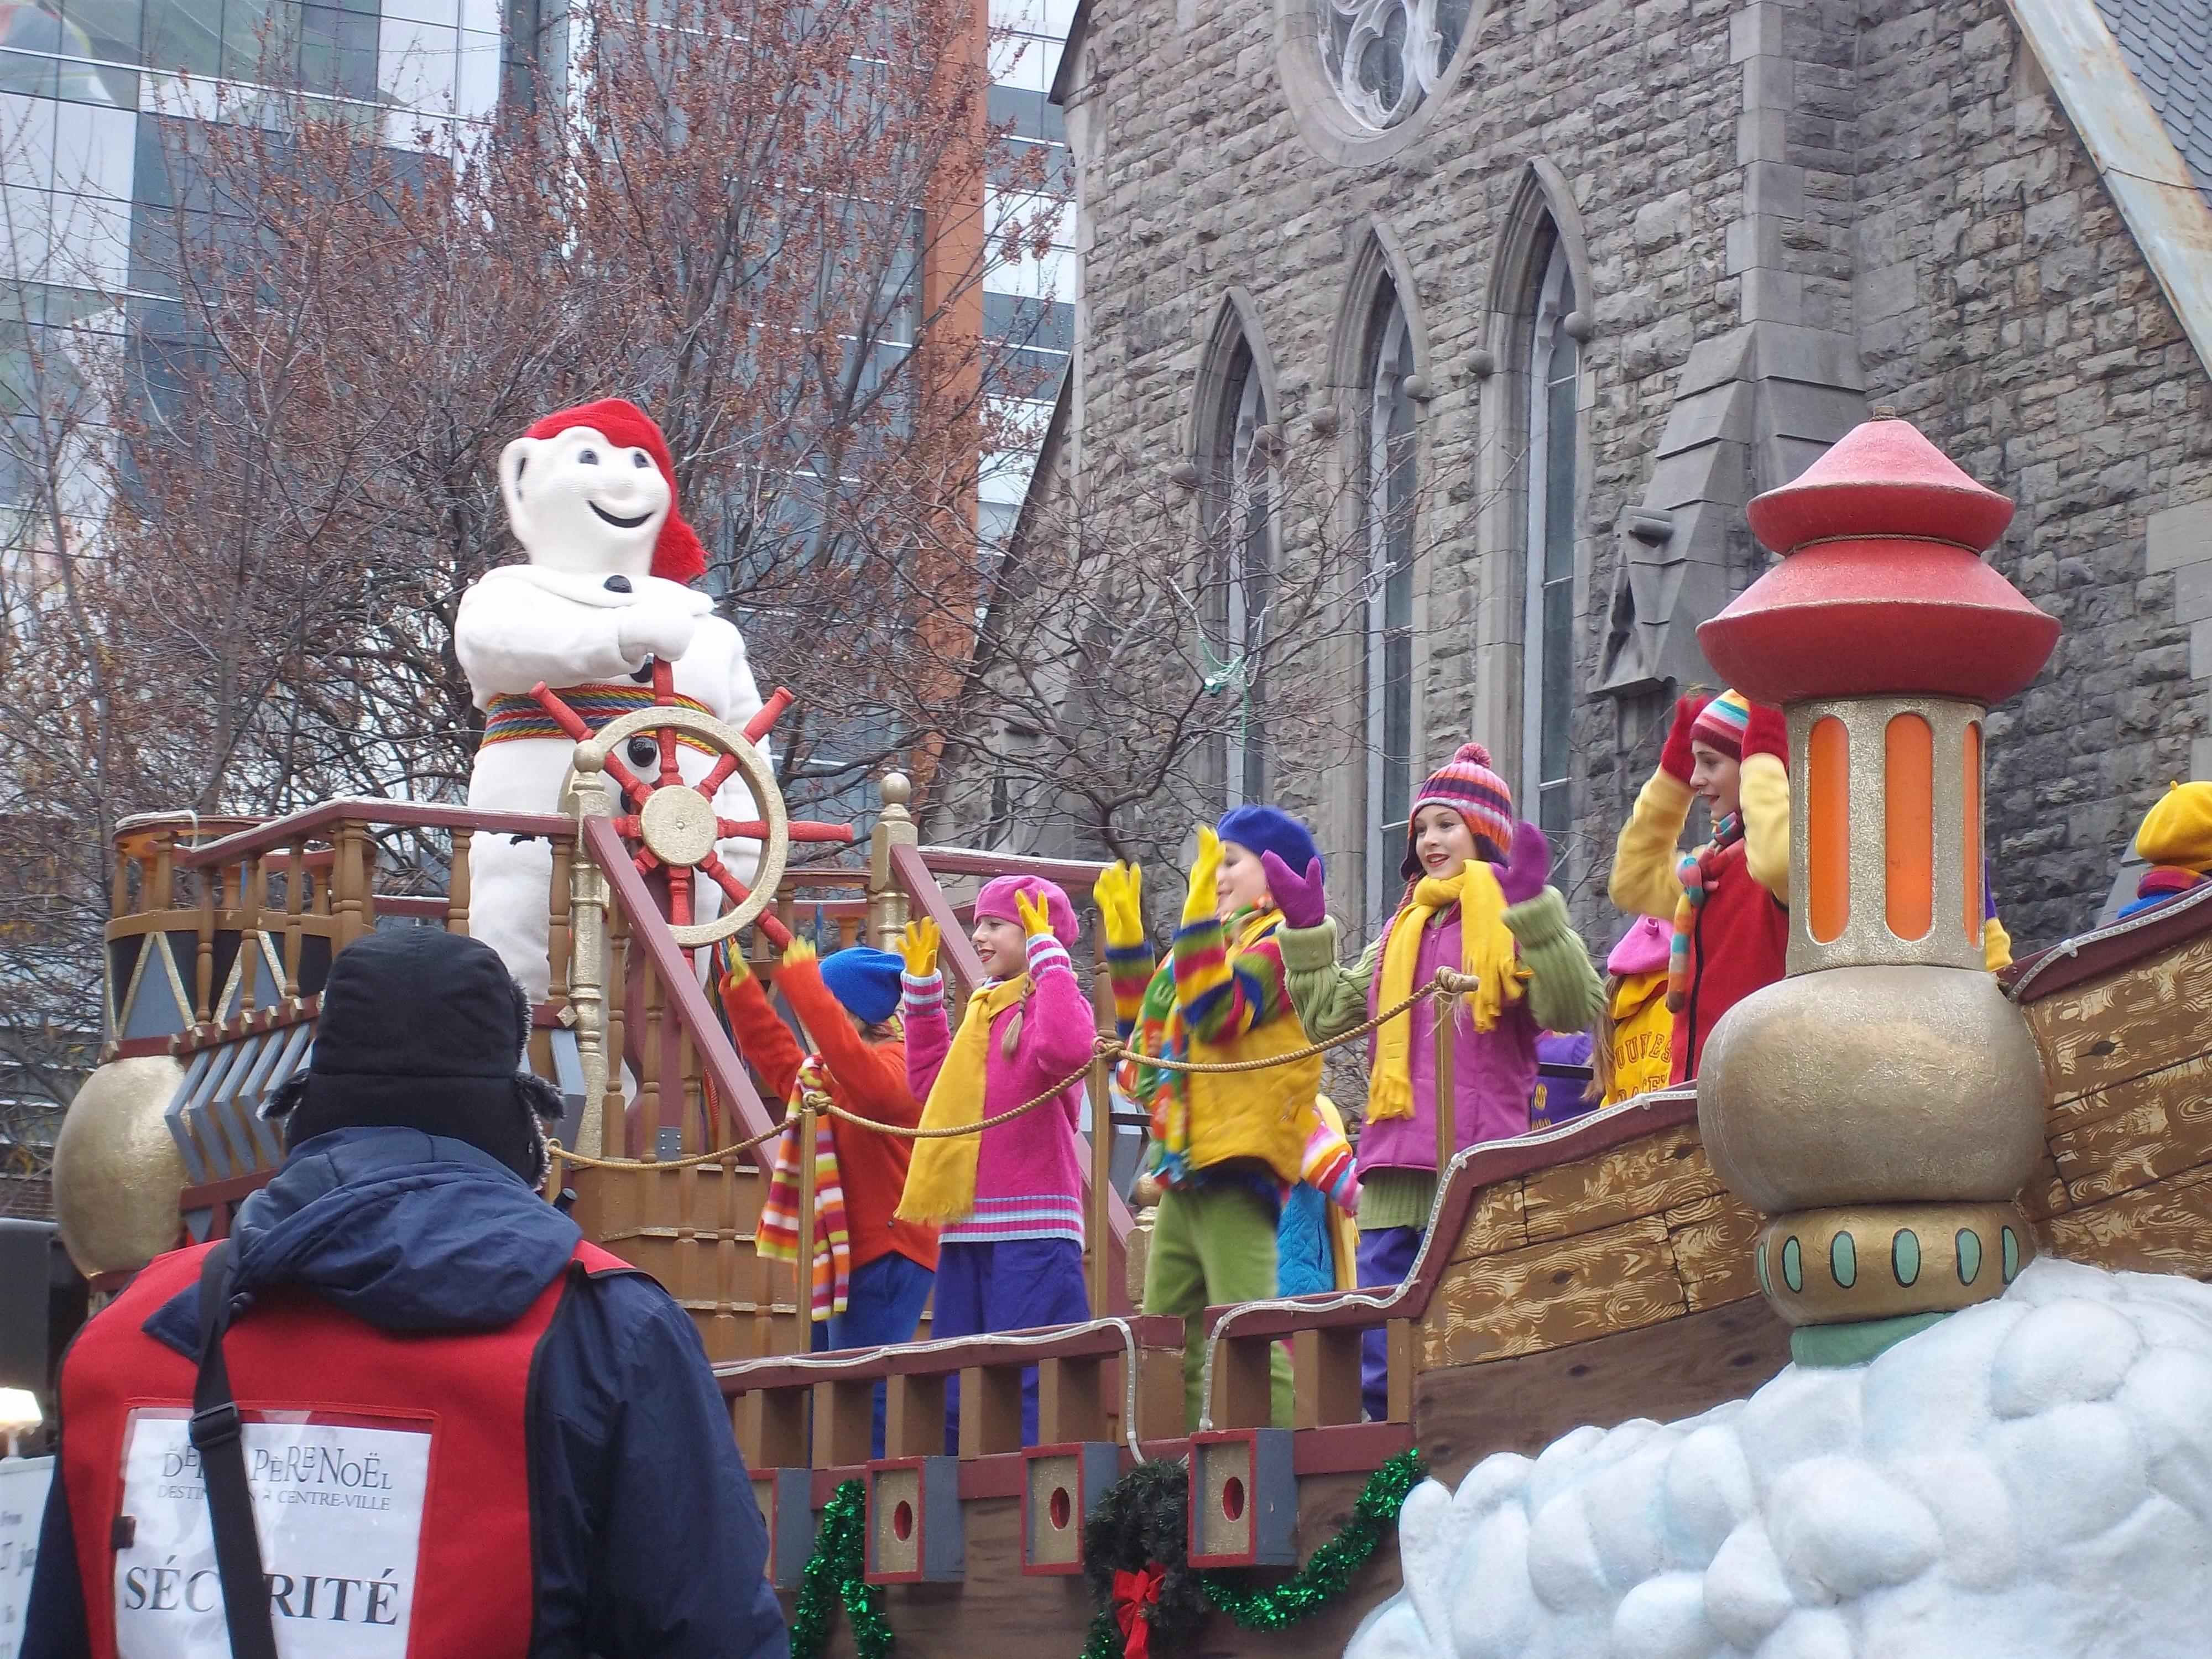 File:Defile du Pere Noel Montreal 2011 - 040.jpg - Wikimedia Commons